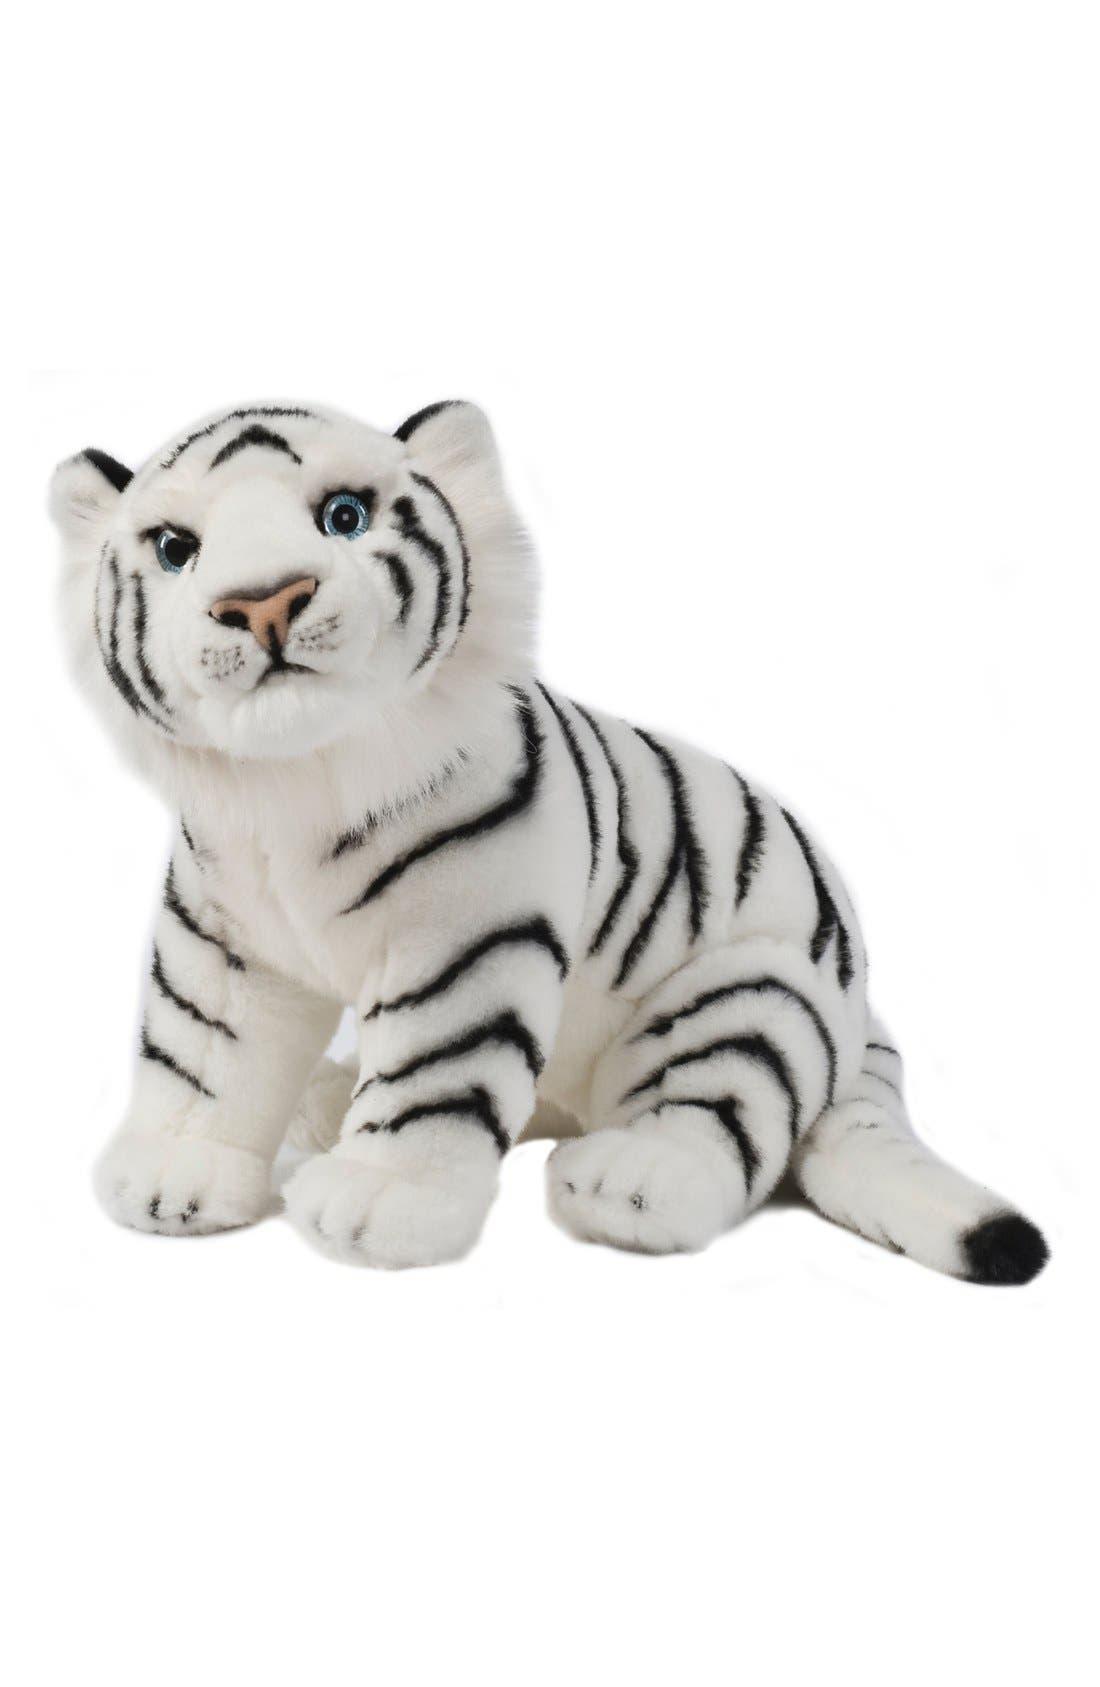 'Sitting White Tiger' Stuffed Animal,                             Main thumbnail 1, color,                             WHITE